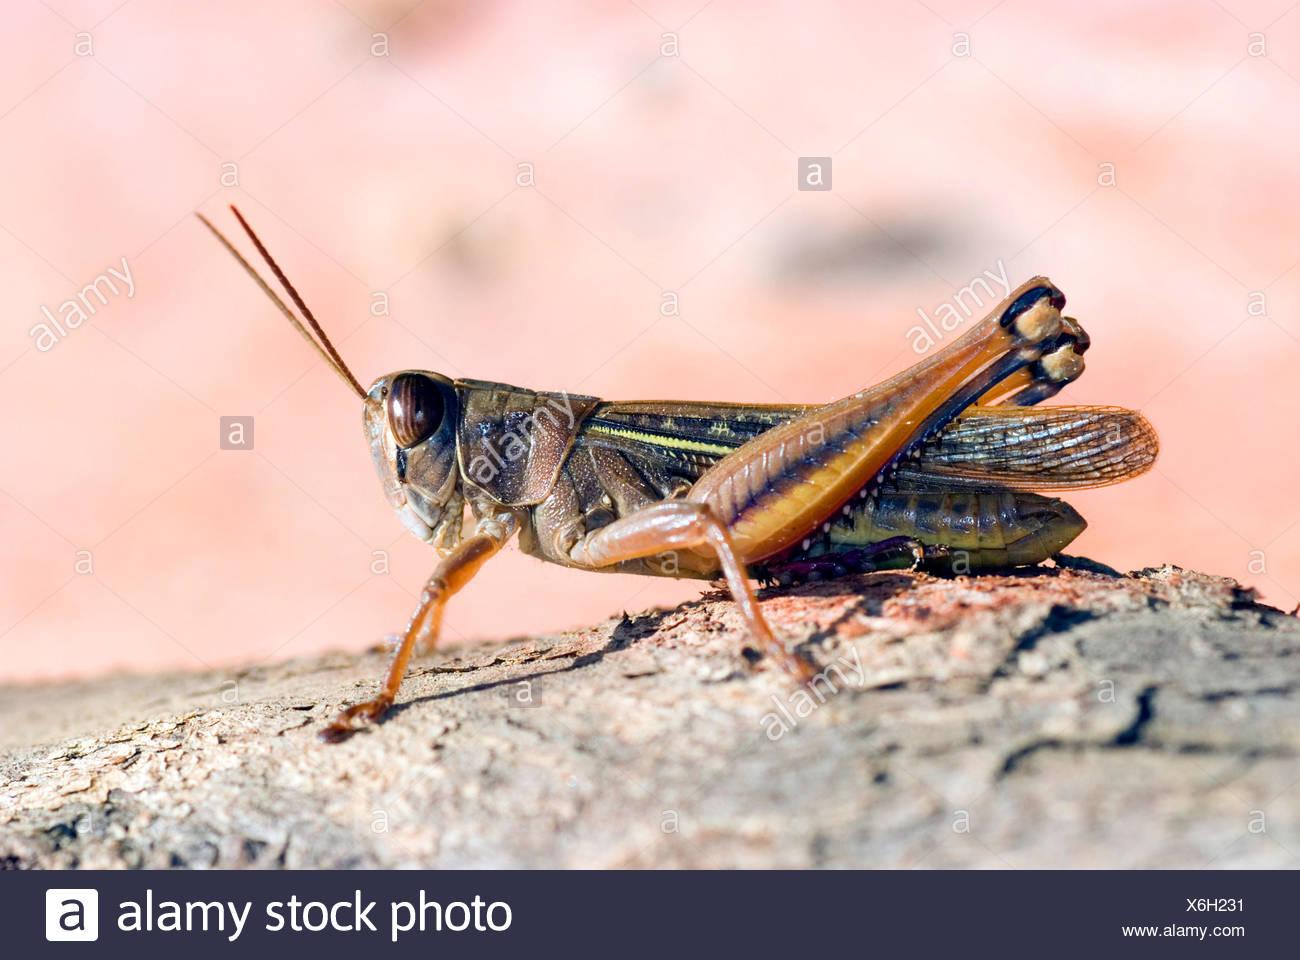 Clover grasshopper (Eyprepocnemis plorans), sitting on a rock, France, Corsica, St.Florent/Neben Dolce Aqua/Kors - Stock Image